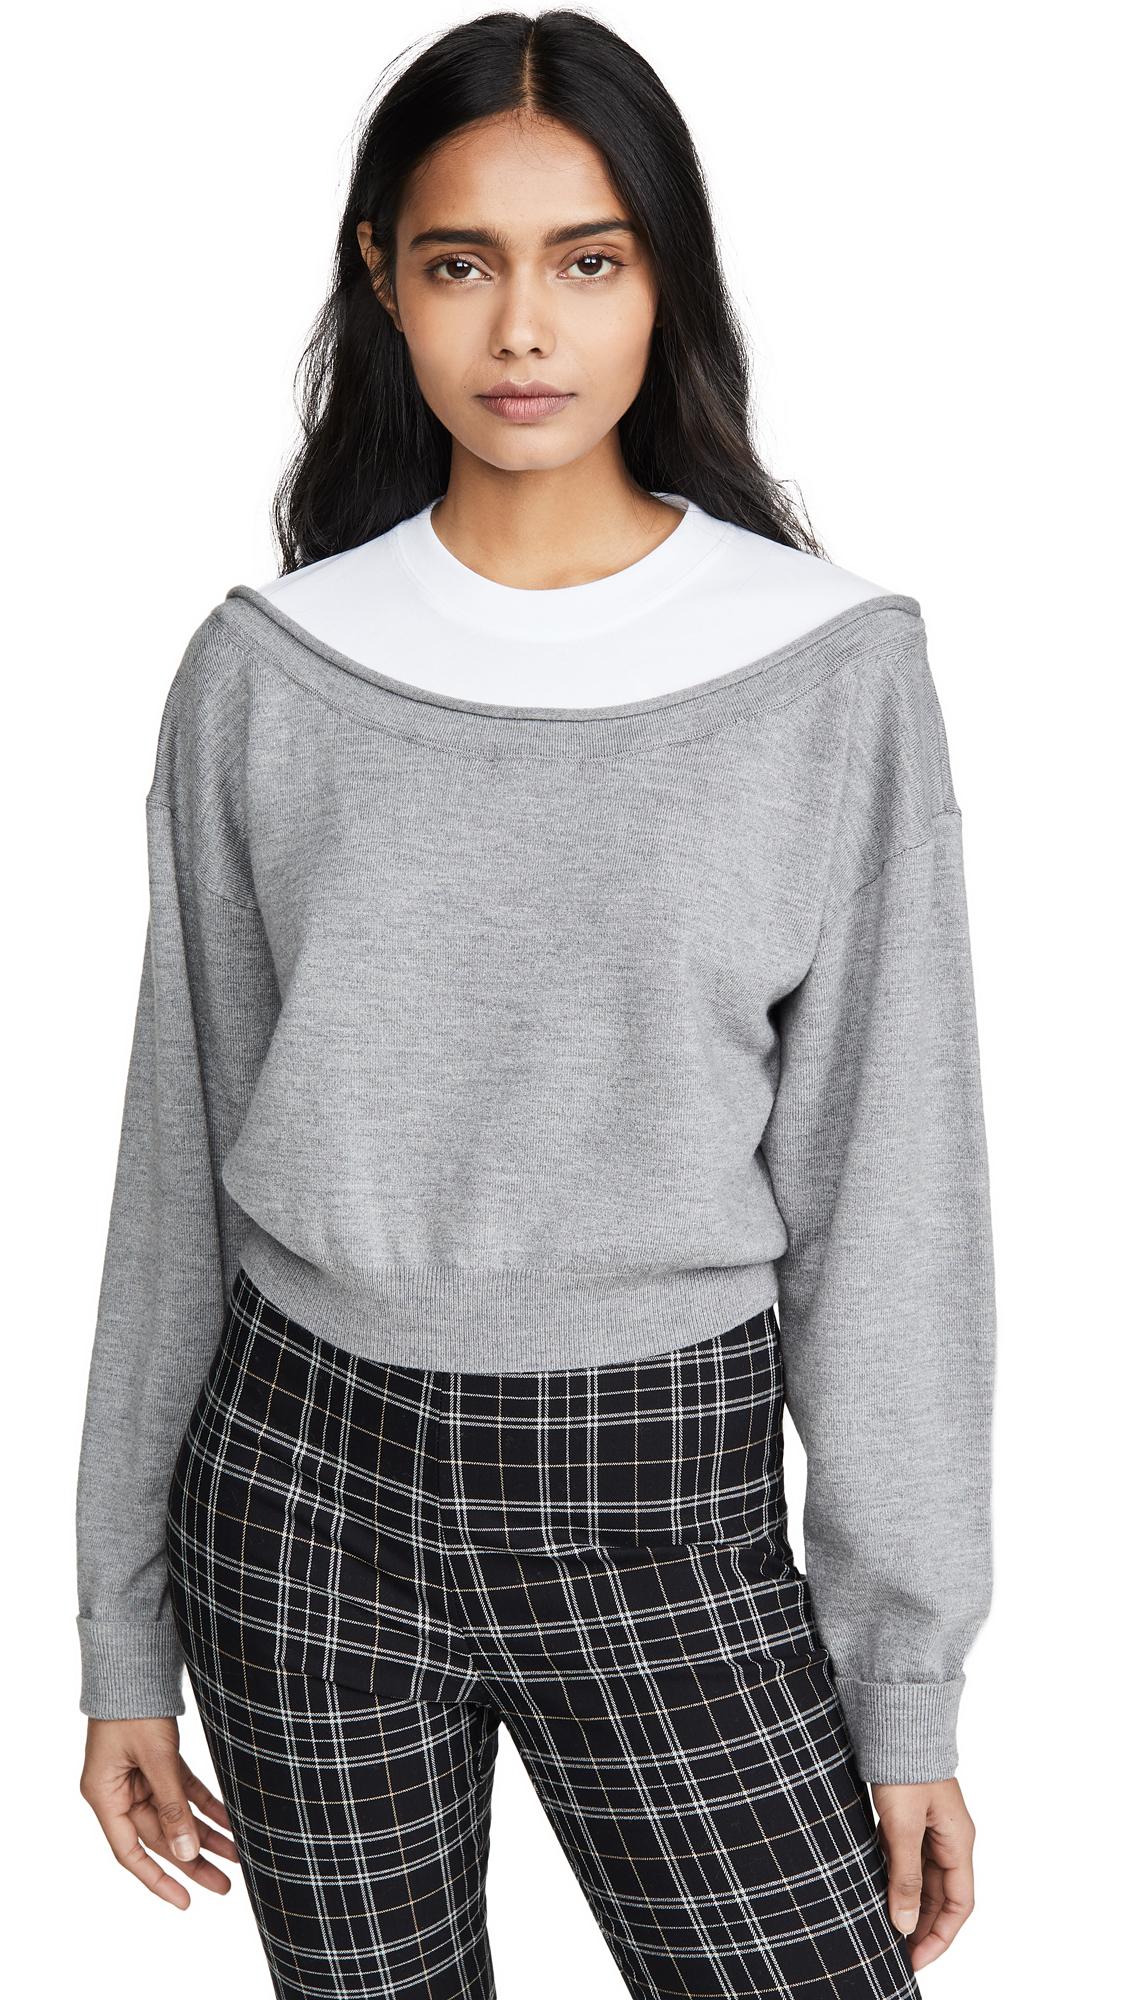 Photo of alexanderwang.t Peelaway Bi-Layer Cropped Pullover - shop alexanderwang.t Clothing, Shirts, Tops online